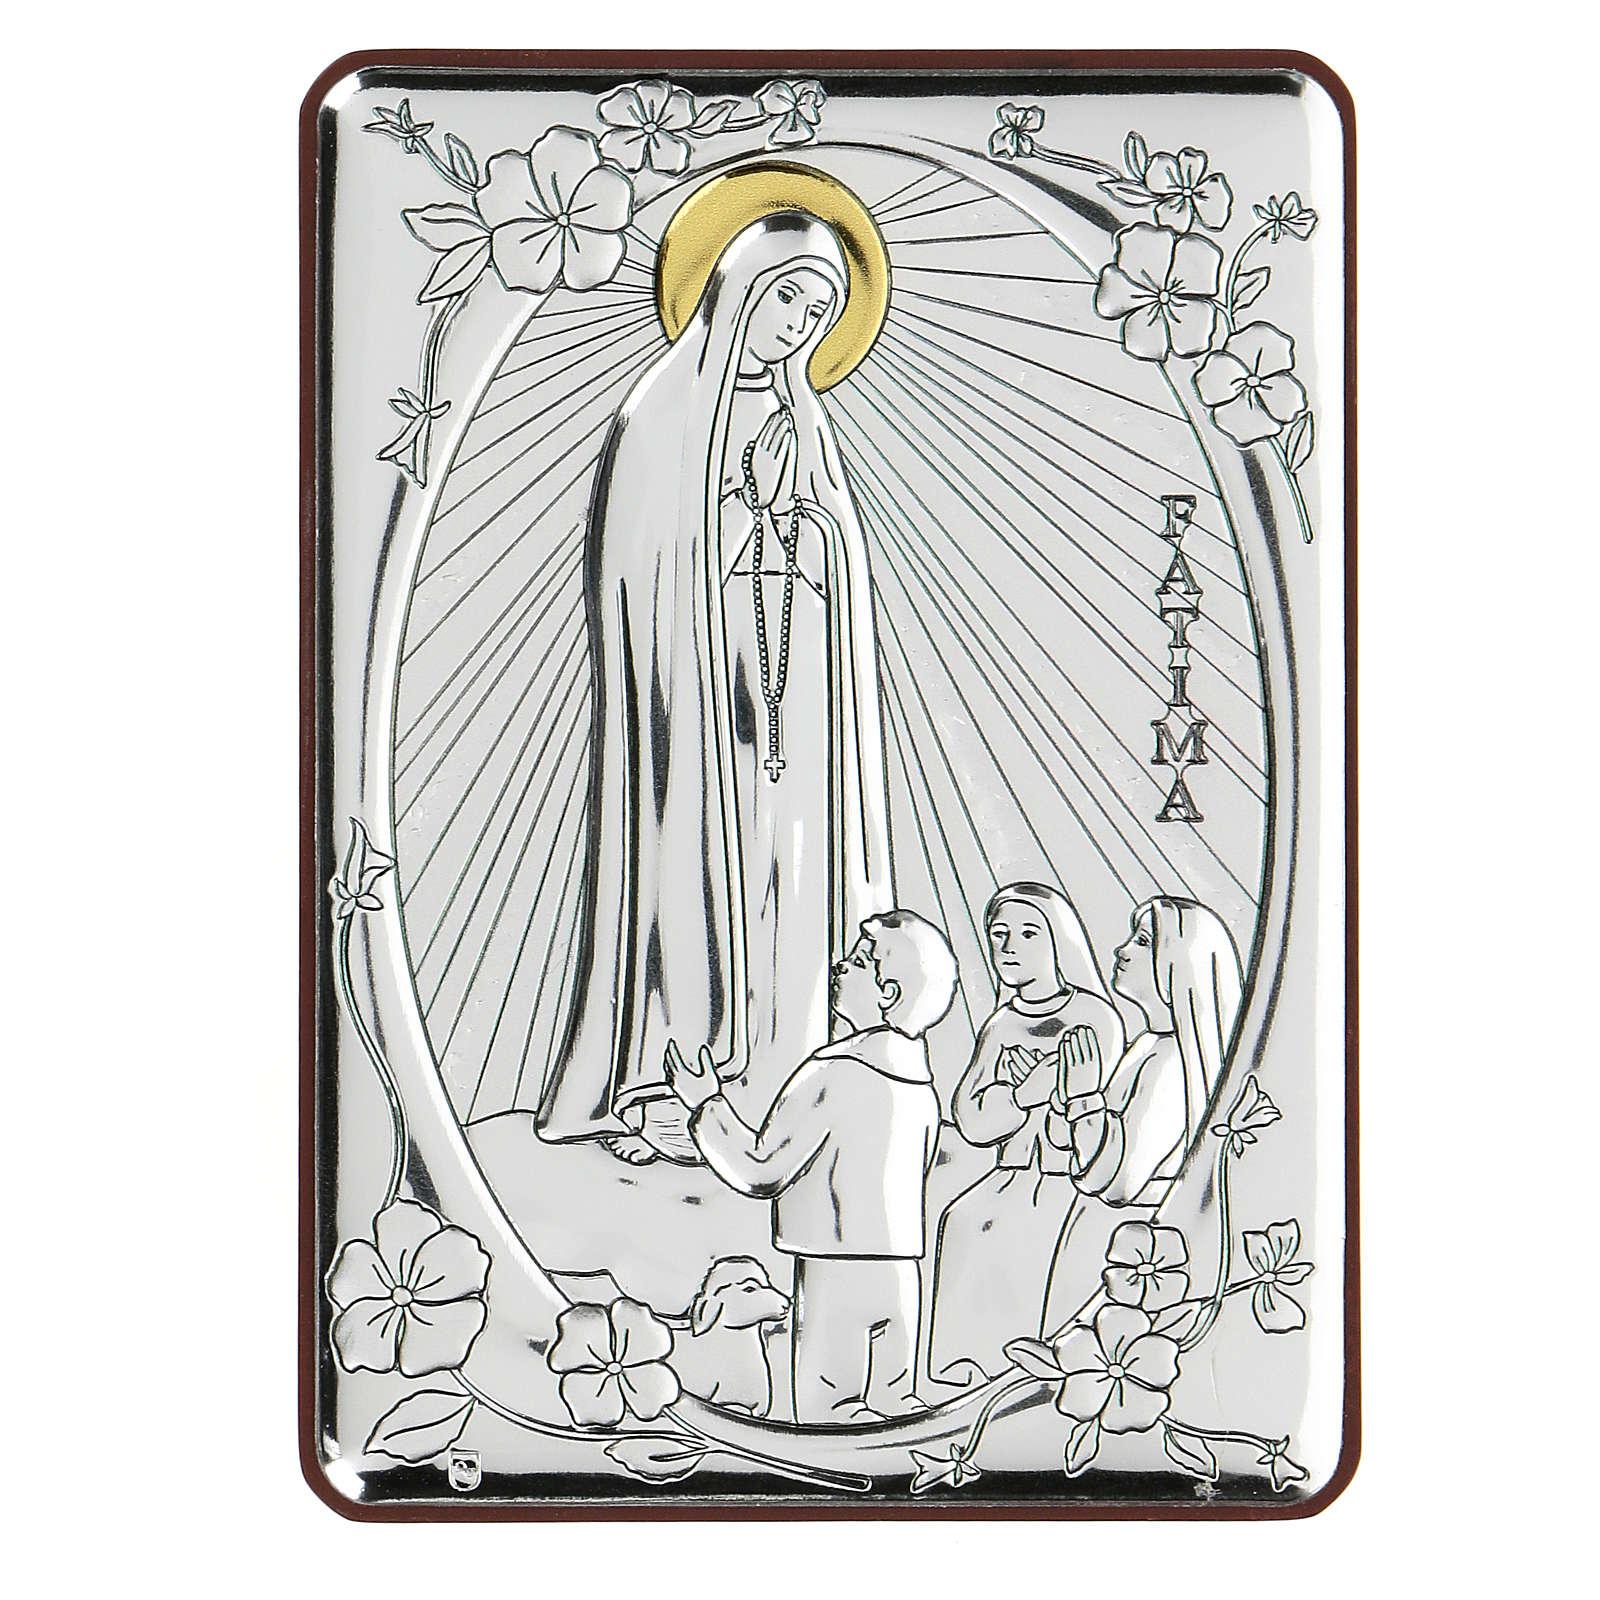 Bas-relief in bilaminate silver Our Lady of Fatima 10x7 cm 4